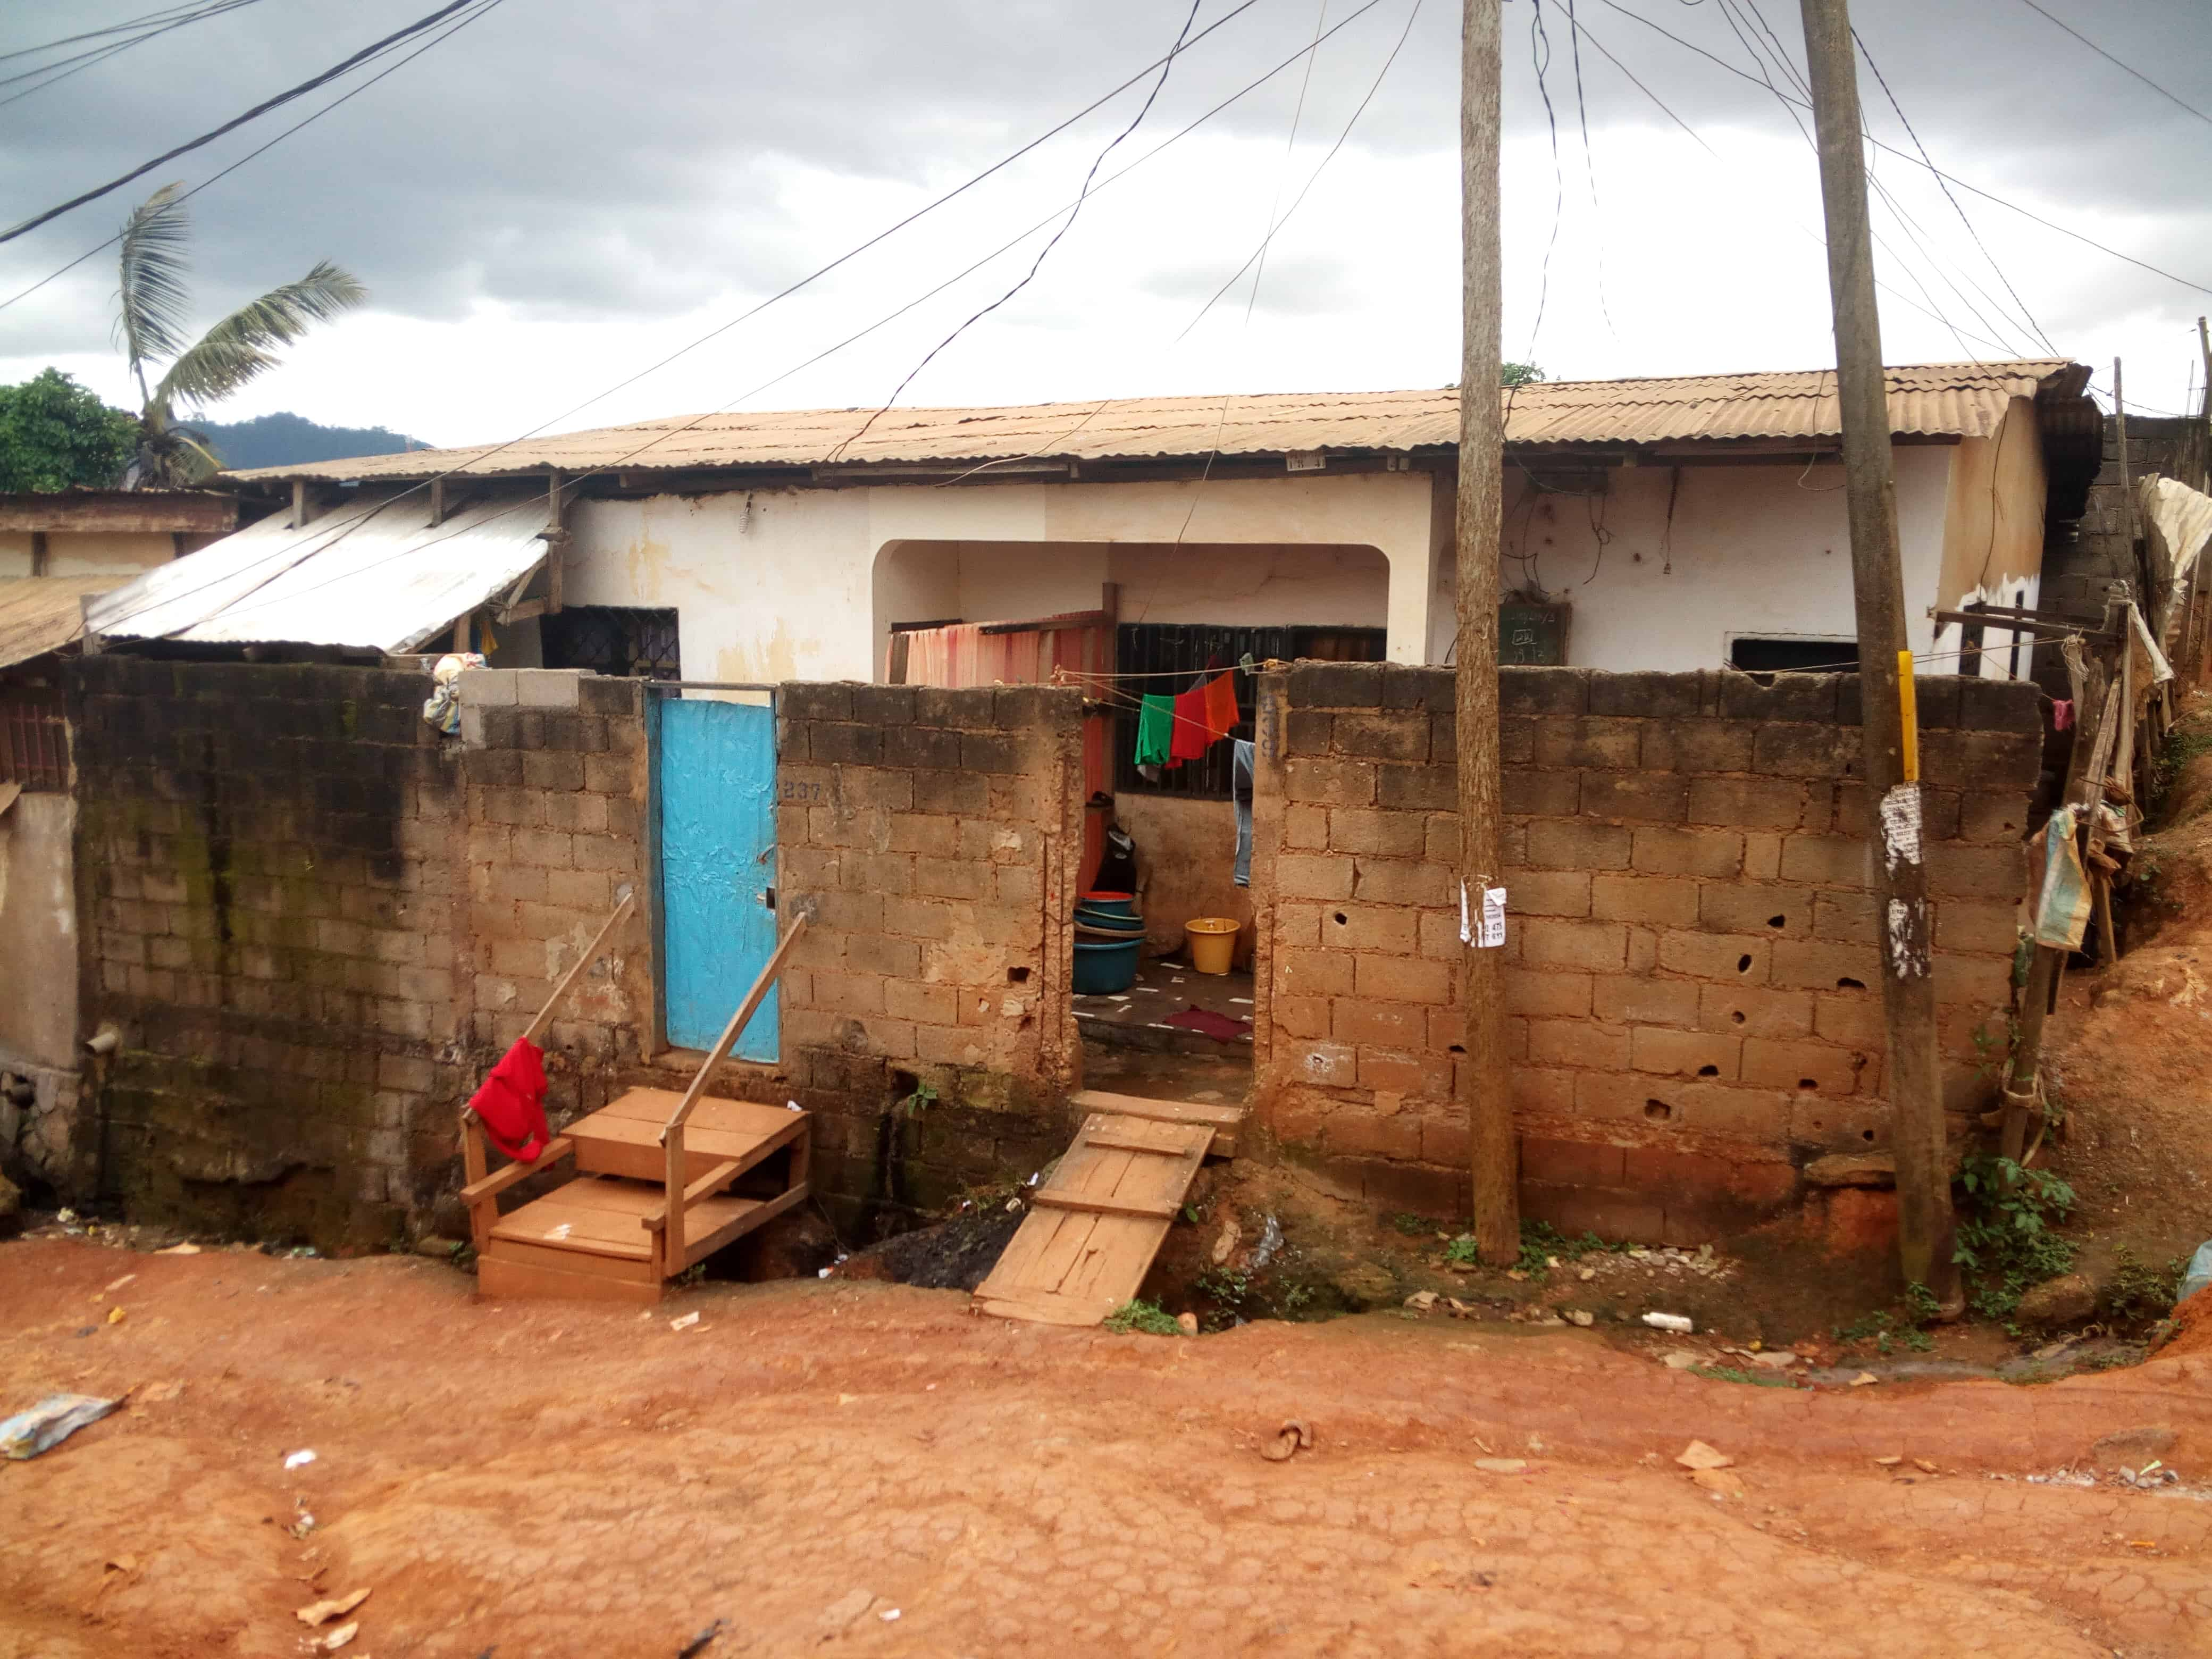 House (Wayside home) for sale - Yaoundé, Biyem-Assi, Tam-tam - 3 living room(s), 4 bedroom(s), 2 bathroom(s) - 25 000 000 FCFA / month